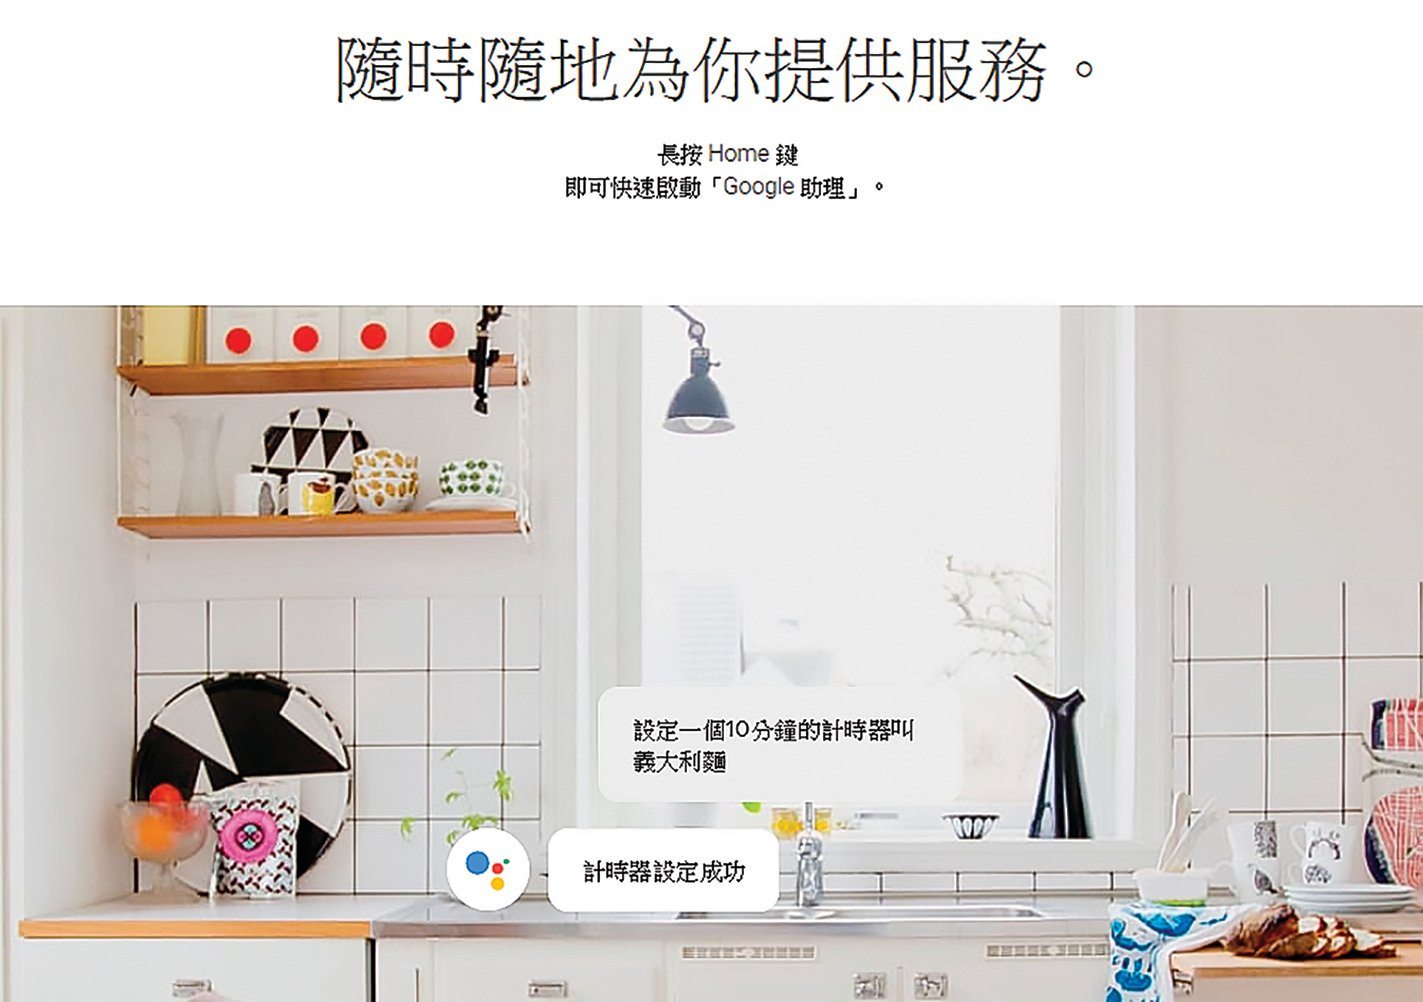 Google助理終於支援中文了,不但介面是正體中文,還聽得懂「台式中文」。(網頁截圖)